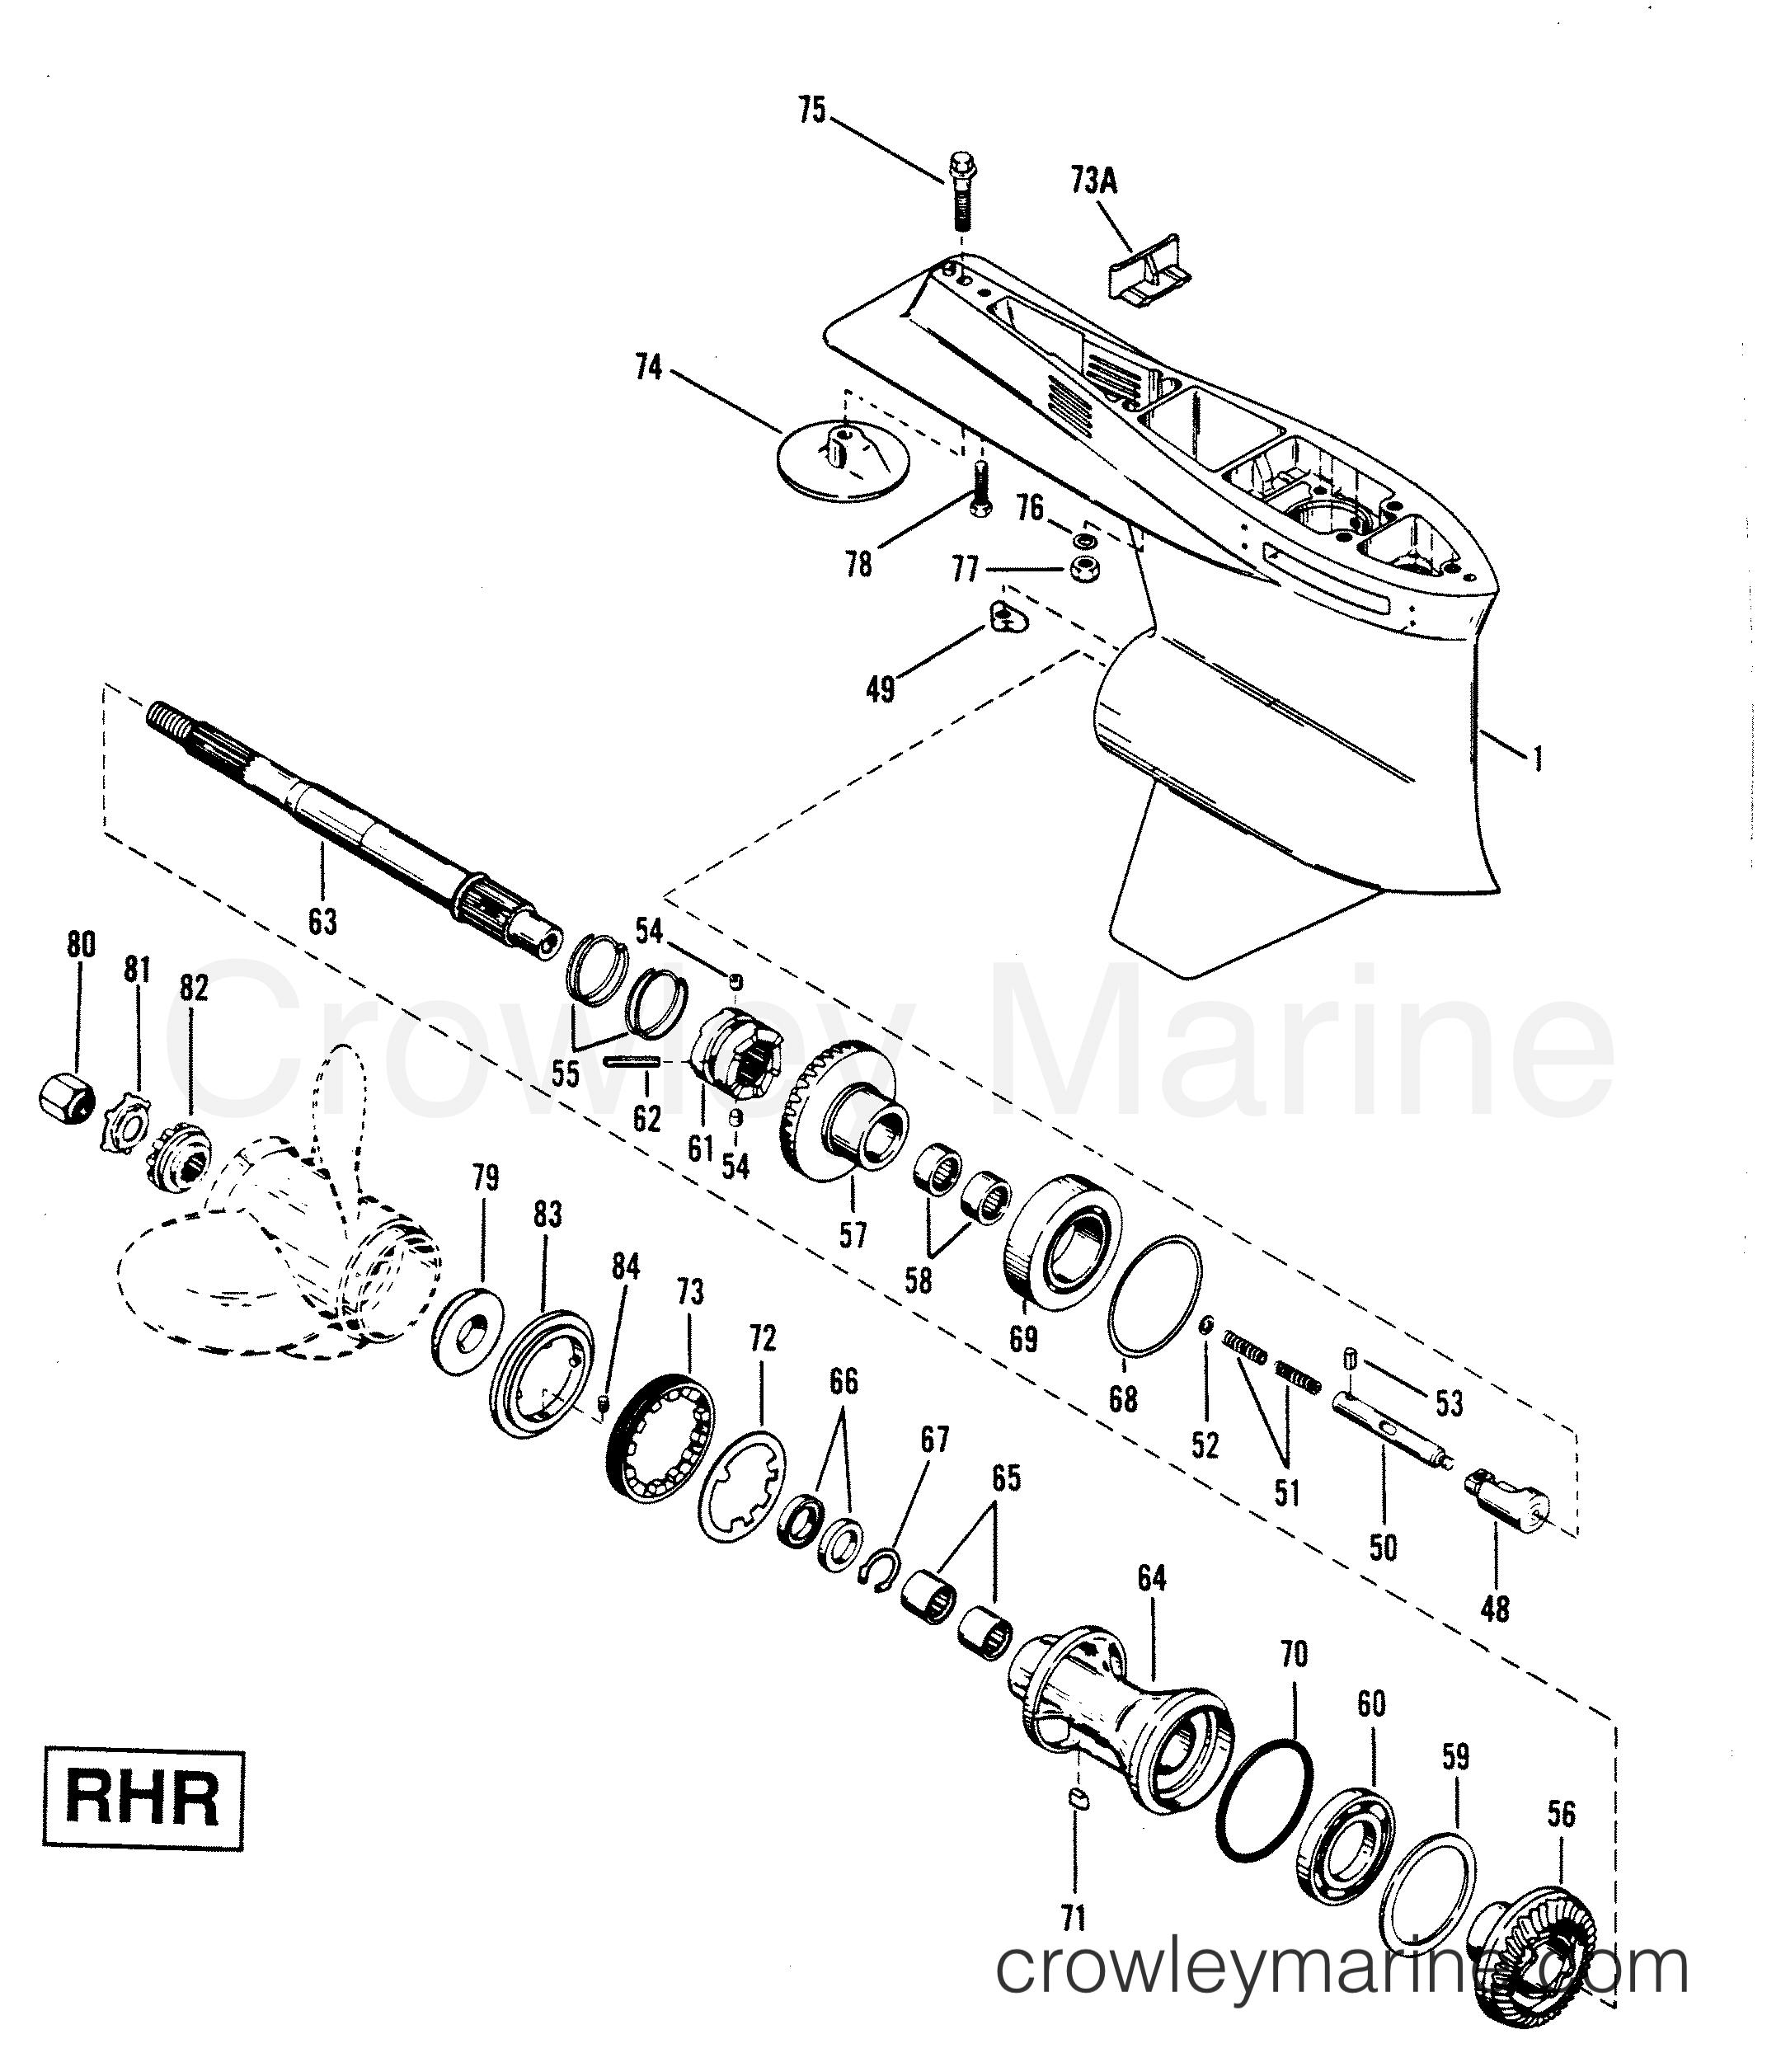 1991 Mercury Race Outboard 2.5L [L EFI] - 7925211YH - GEAR HOUSING (PROPELLER SHAFT)RHR 2-HOLE WATER PICK-UP section